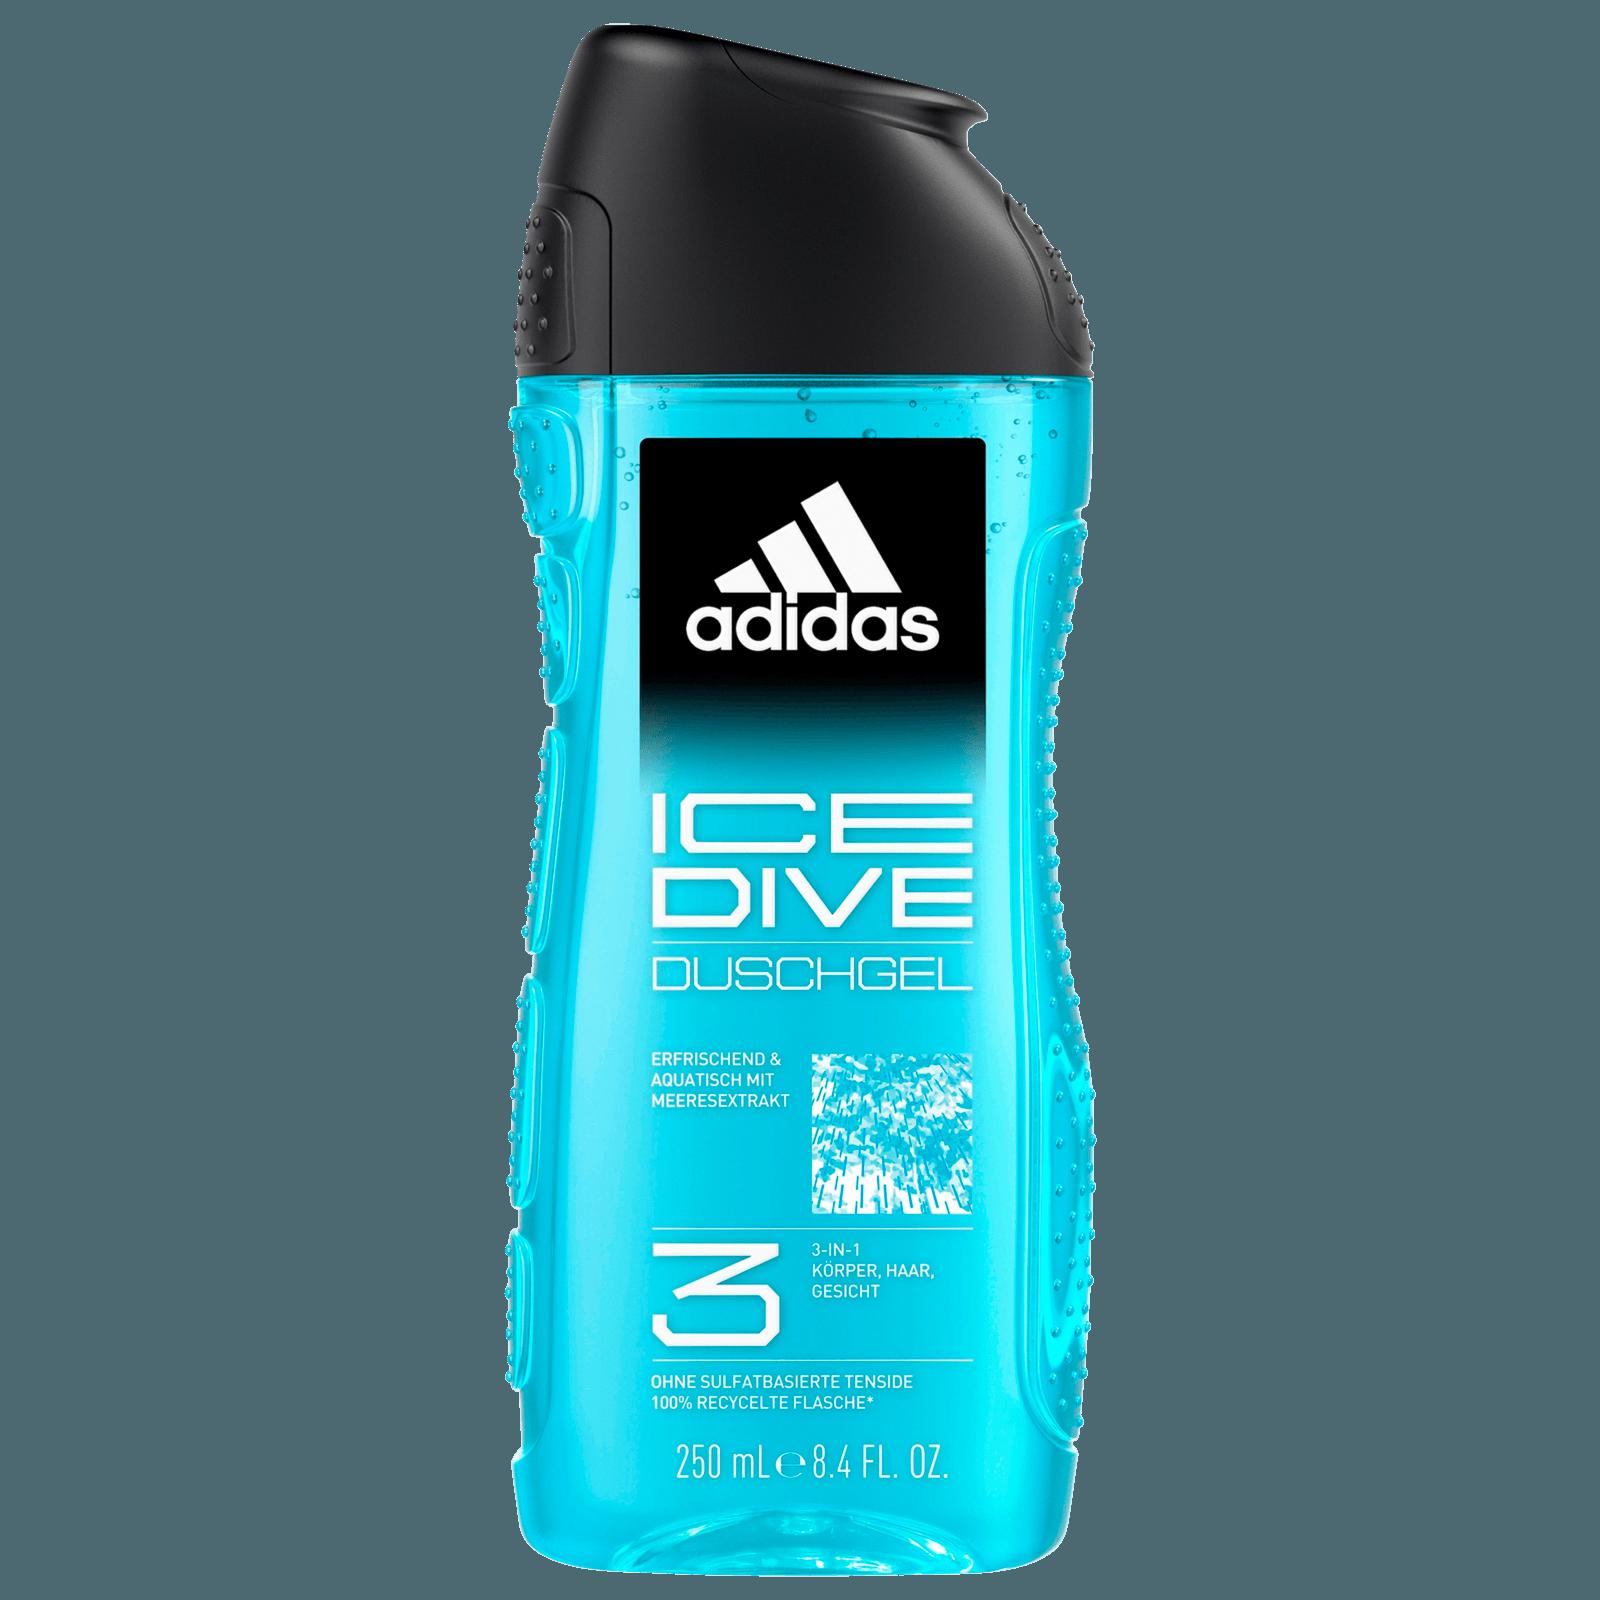 Adidas Ice Dive 3in1 Shower-Gel 250ml